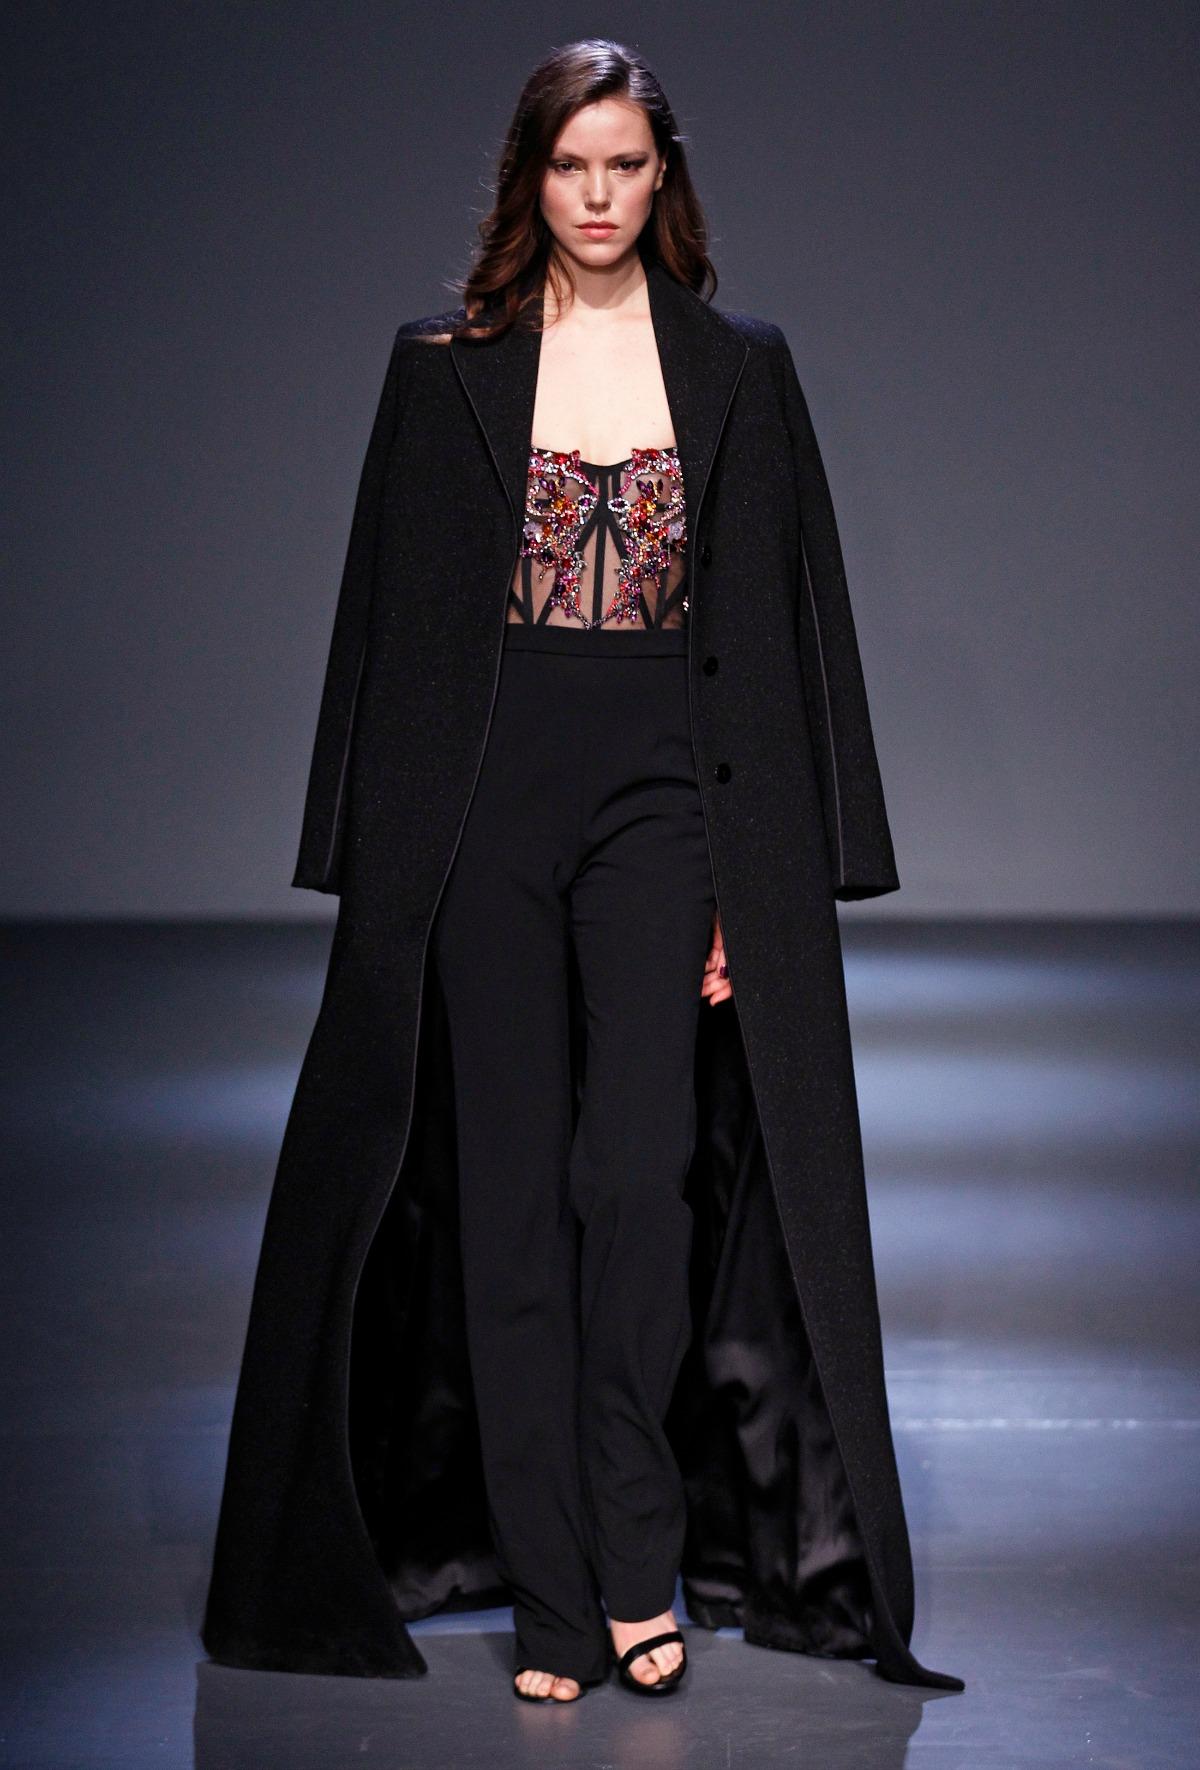 Pamella Roland Fall 2018 Runway I Black Jumpsuit with Embroidered Corset Bodice #NYFW #FallFashion